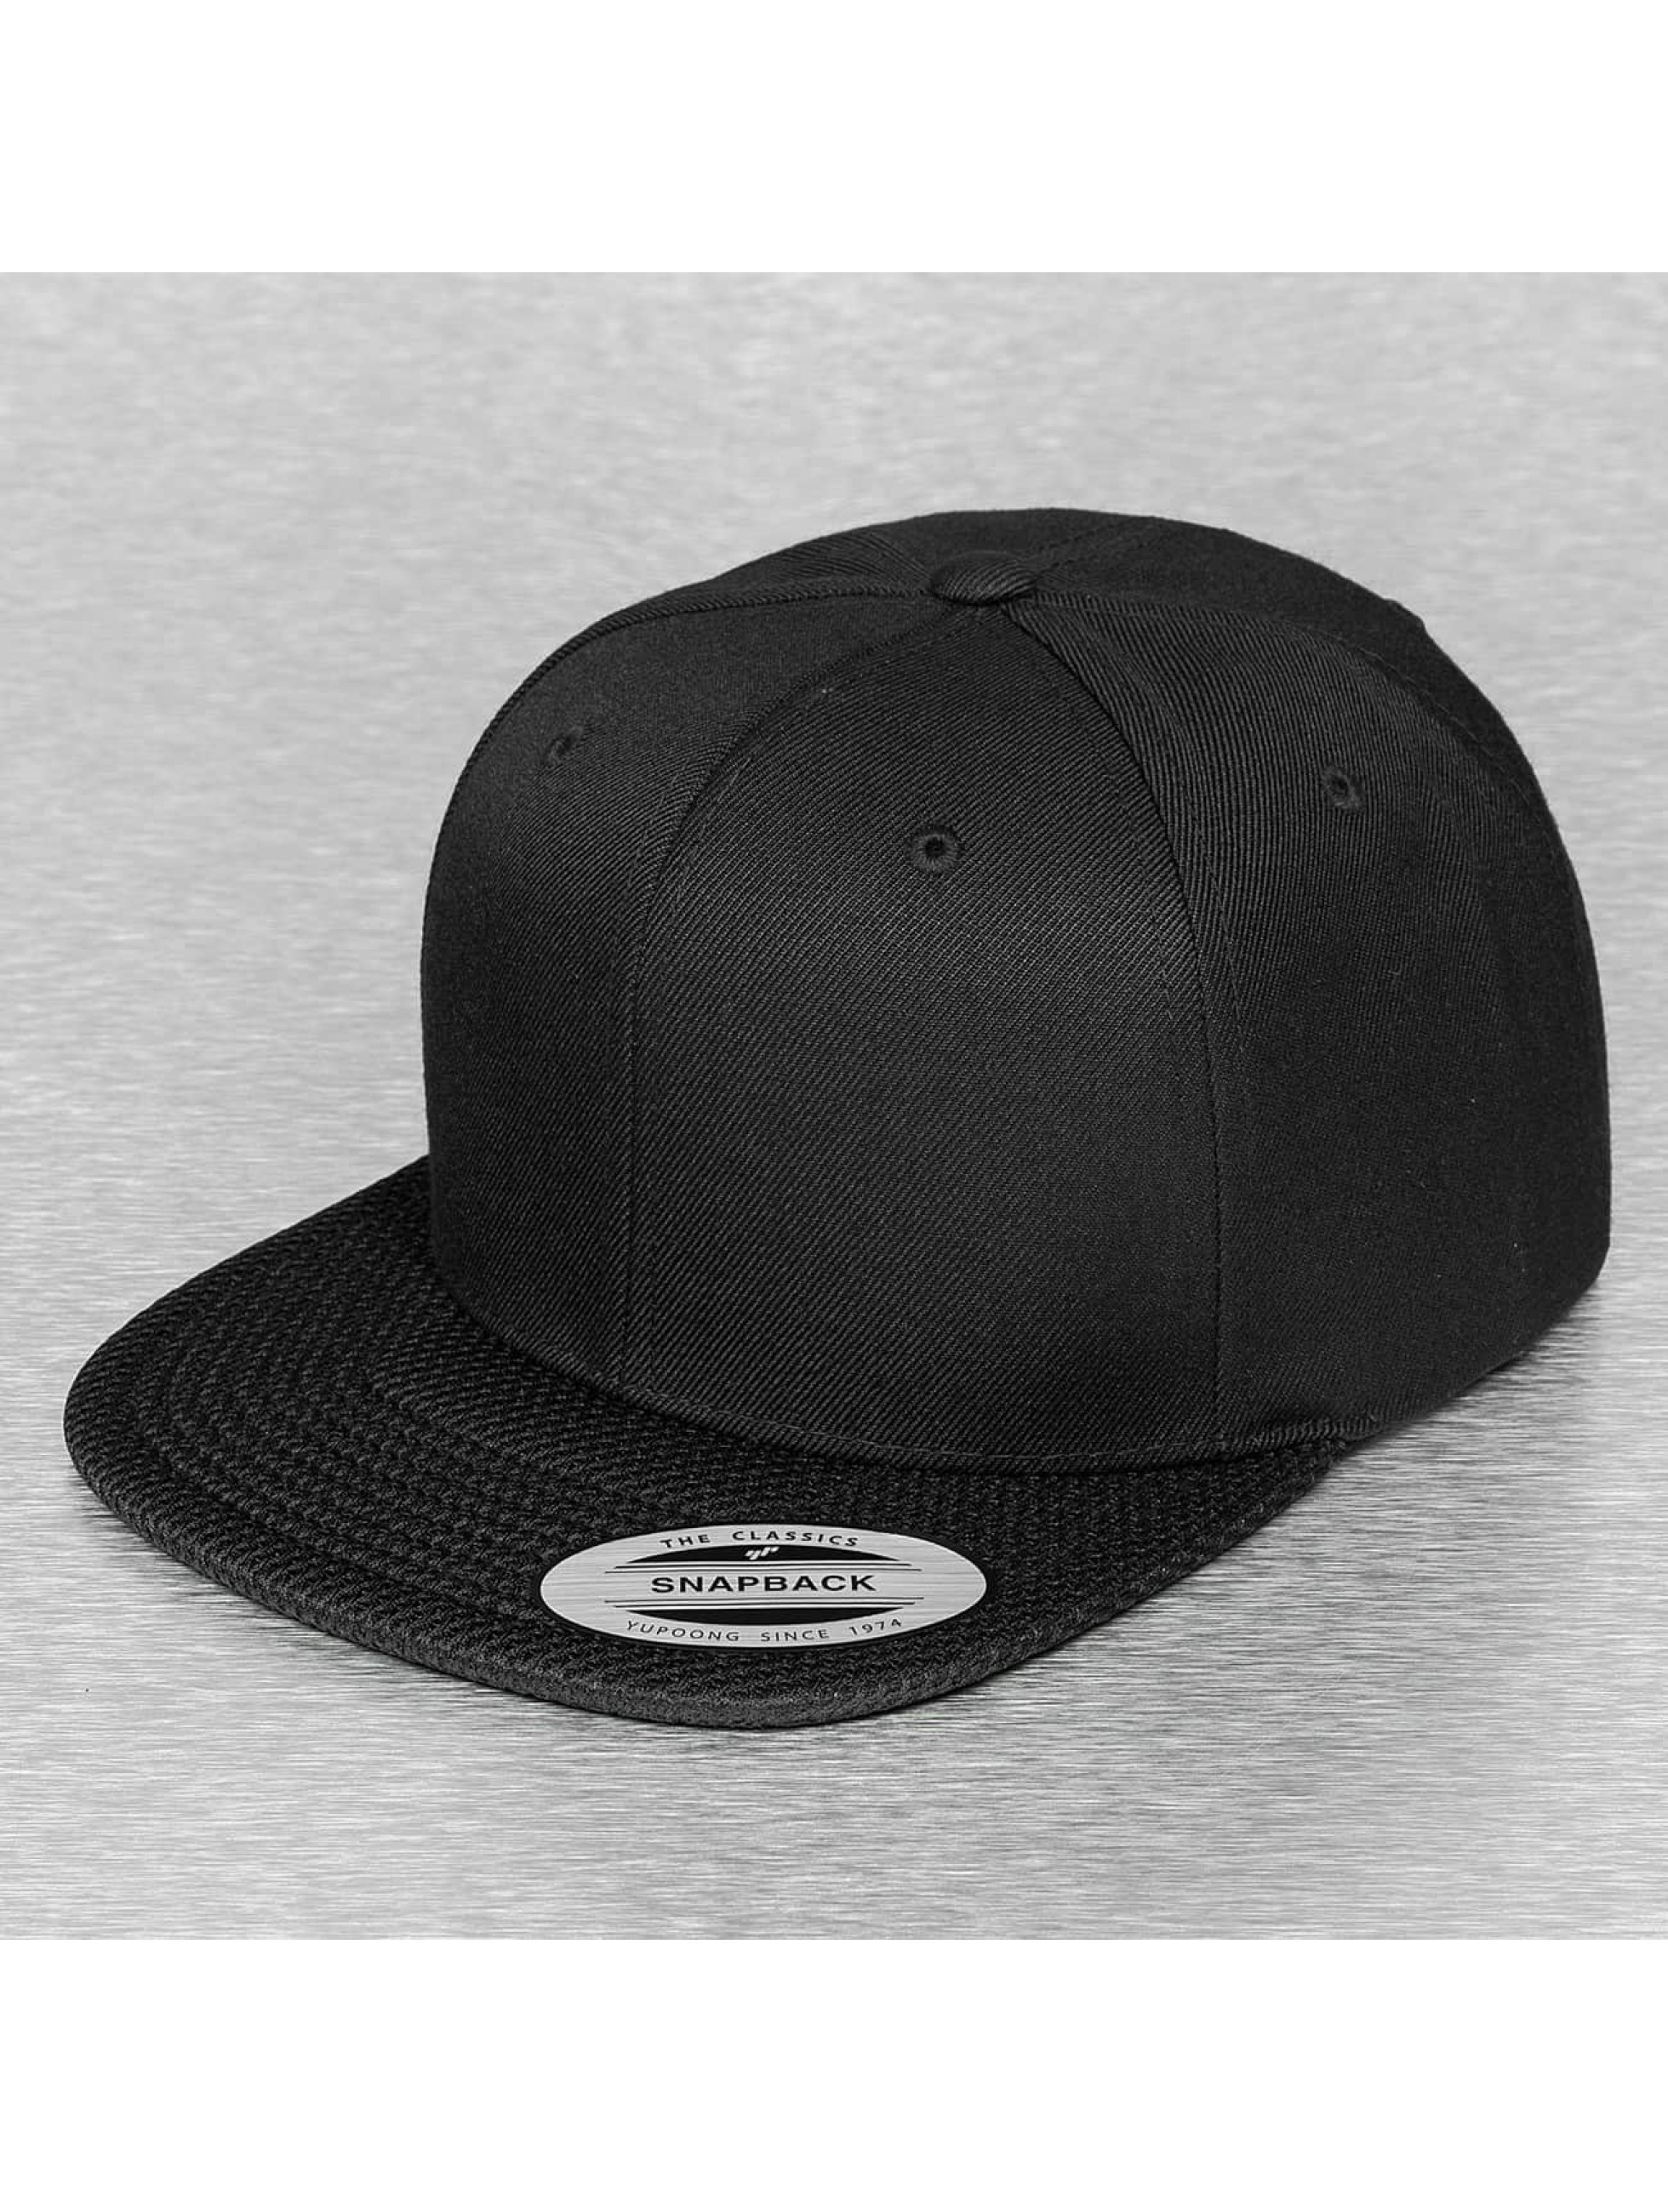 Flexfit Männer,Frauen Snapback Cap Mesh Visor in schwarz